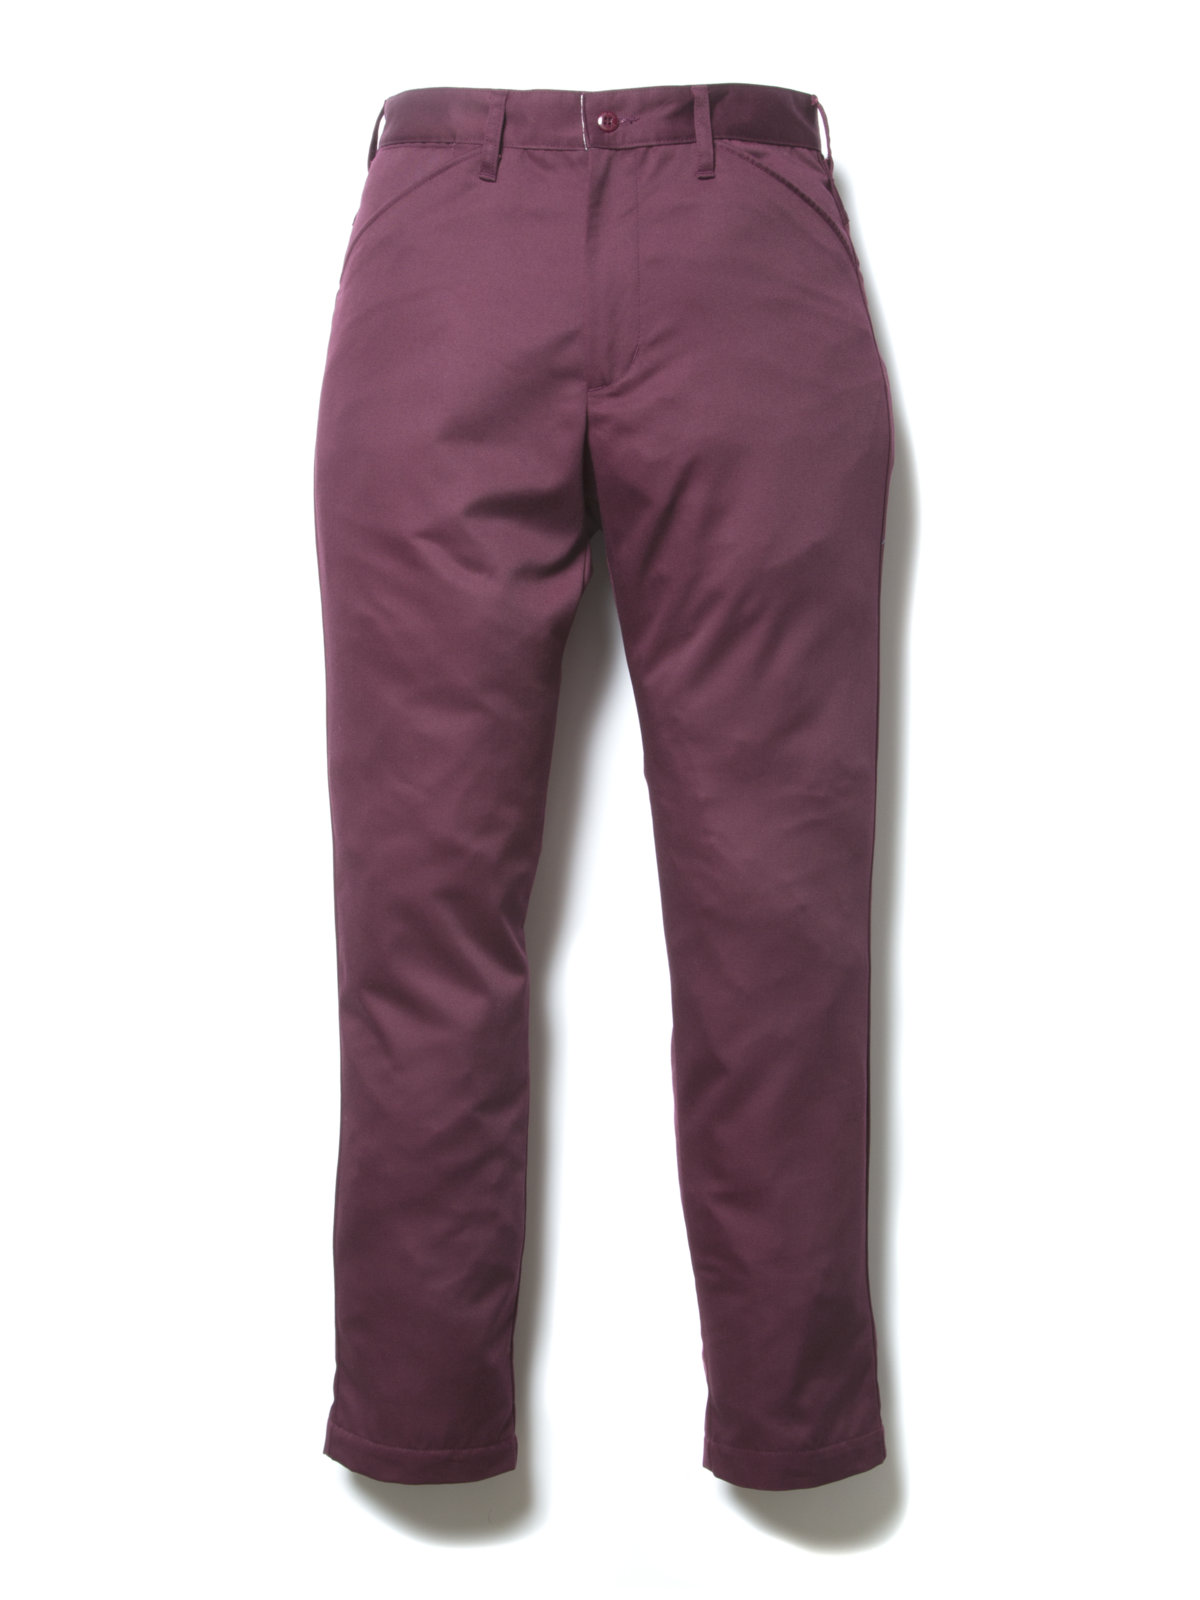 Slim Fit Work Trousers-Burgundy-